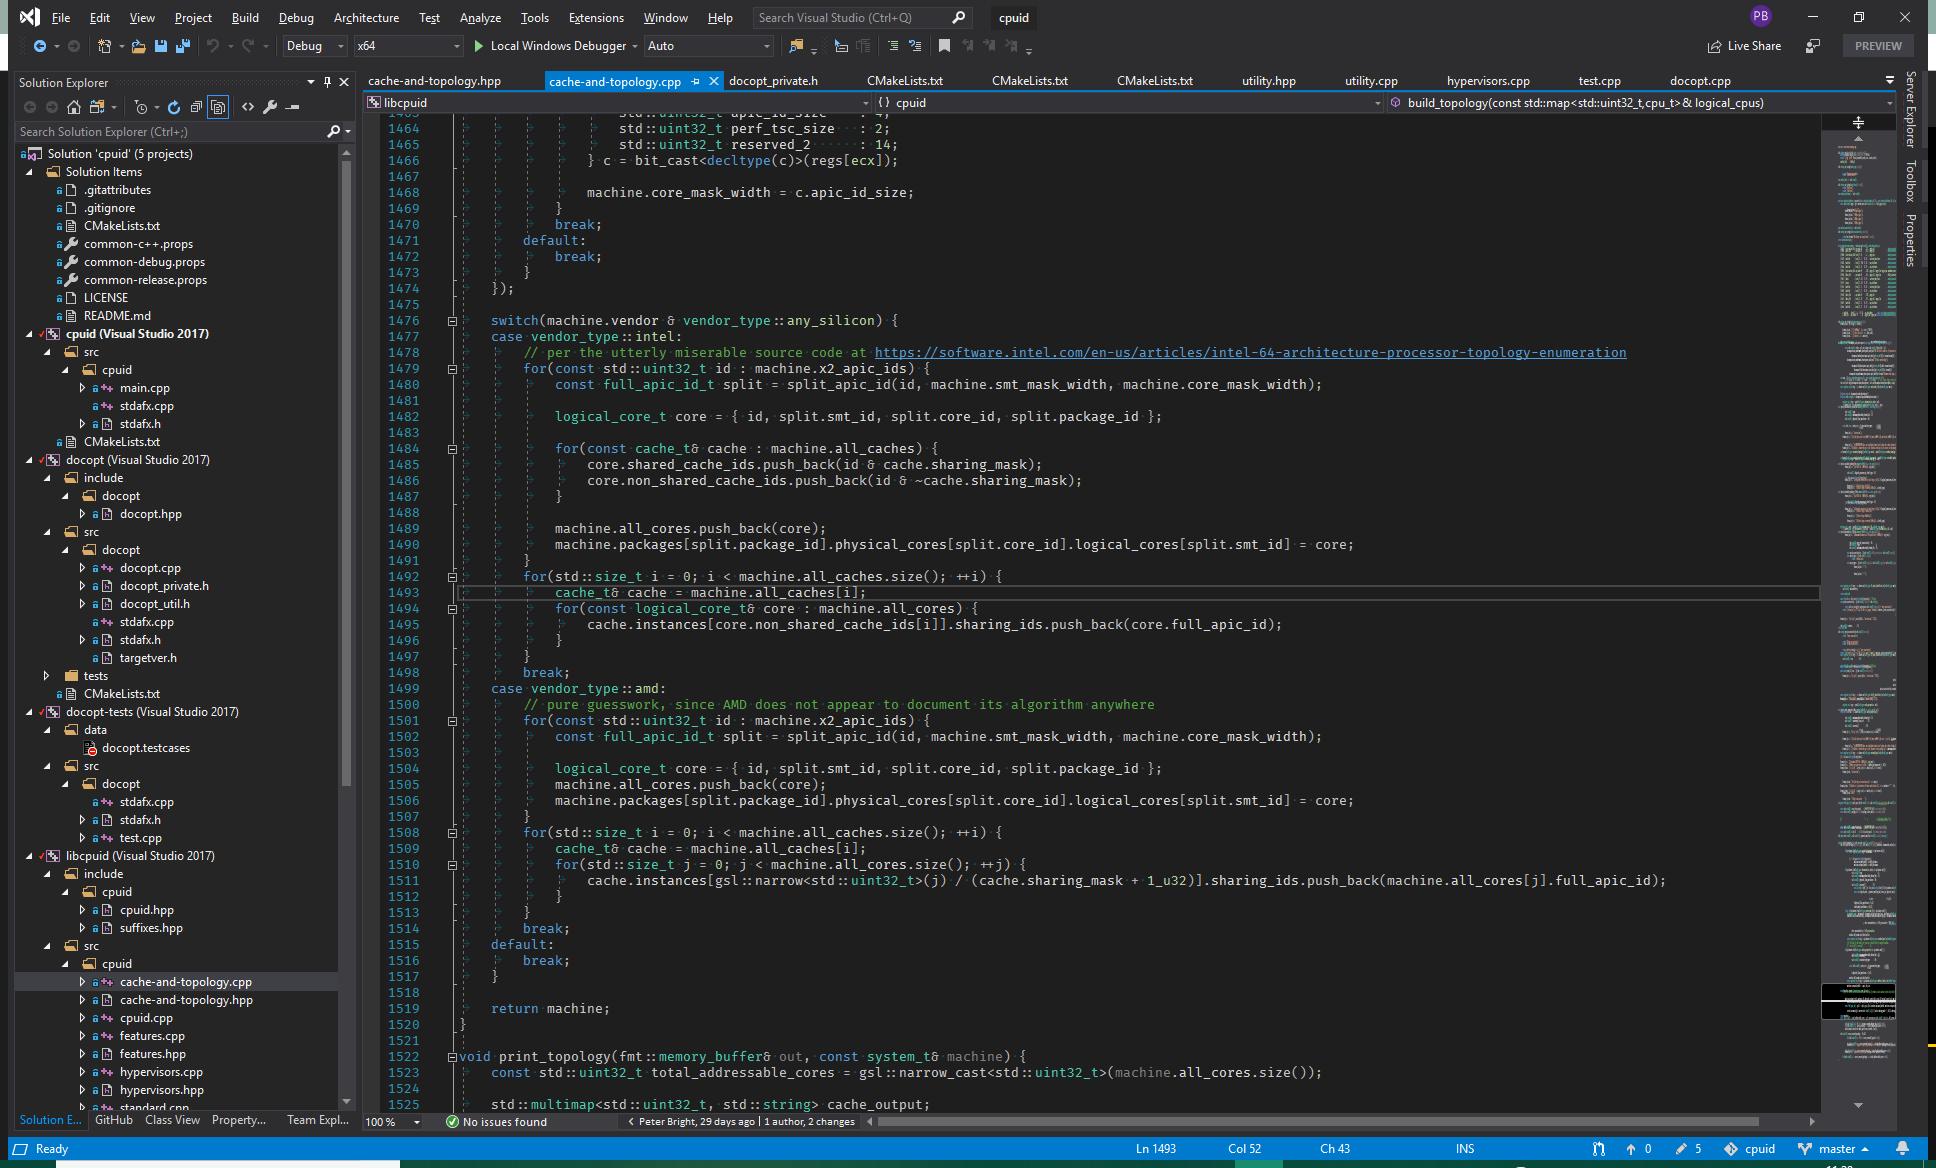 Интерфейс Microsoft Visual Studio Community